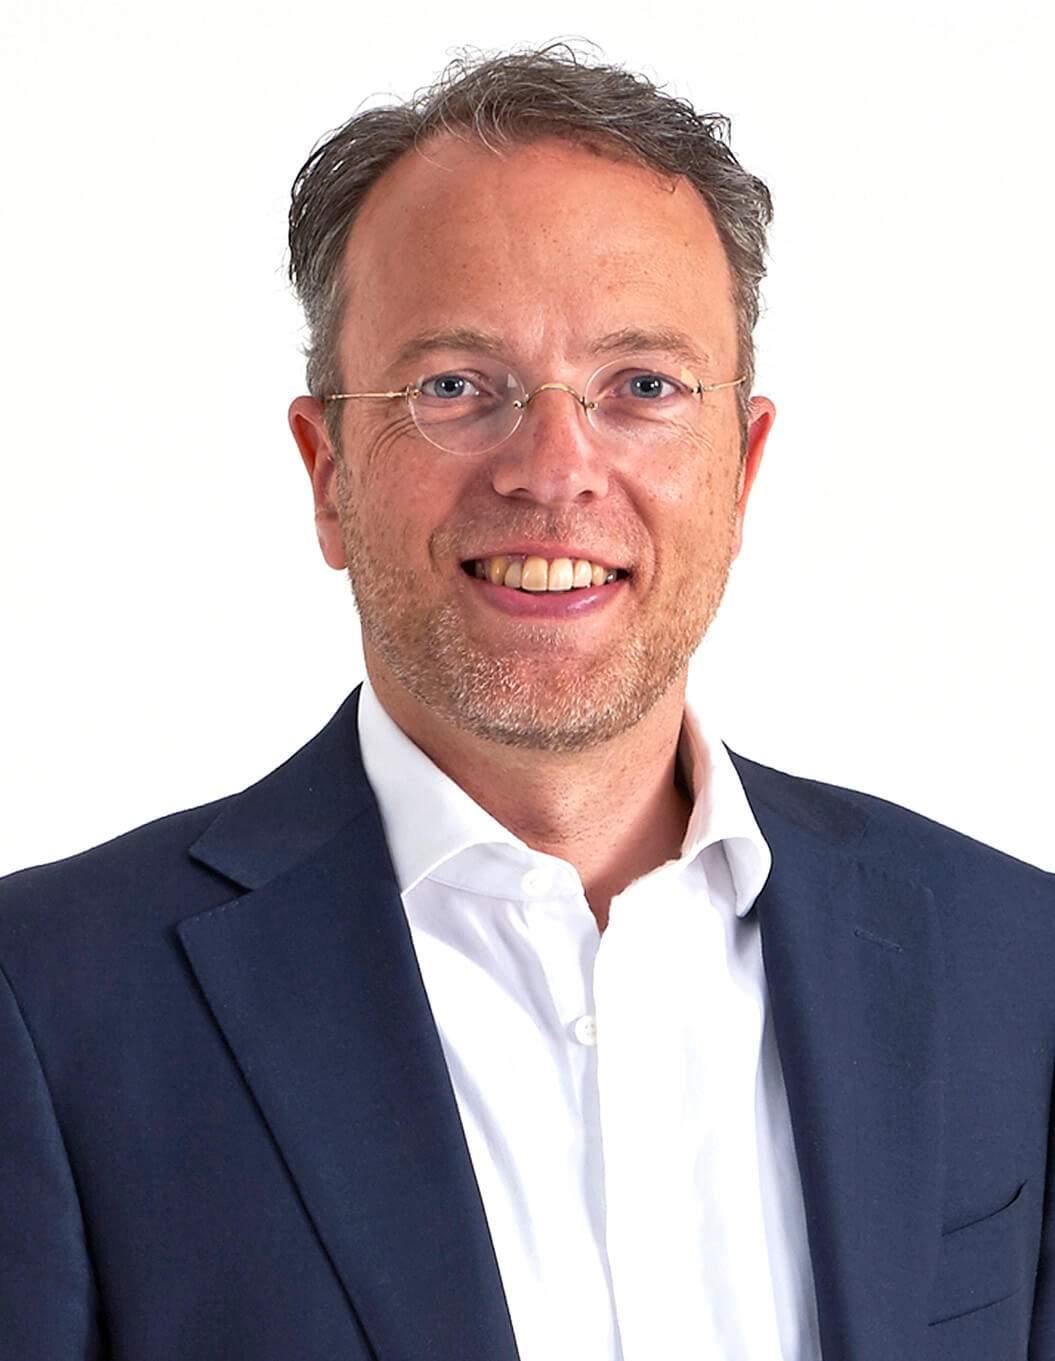 Bart Coopmans